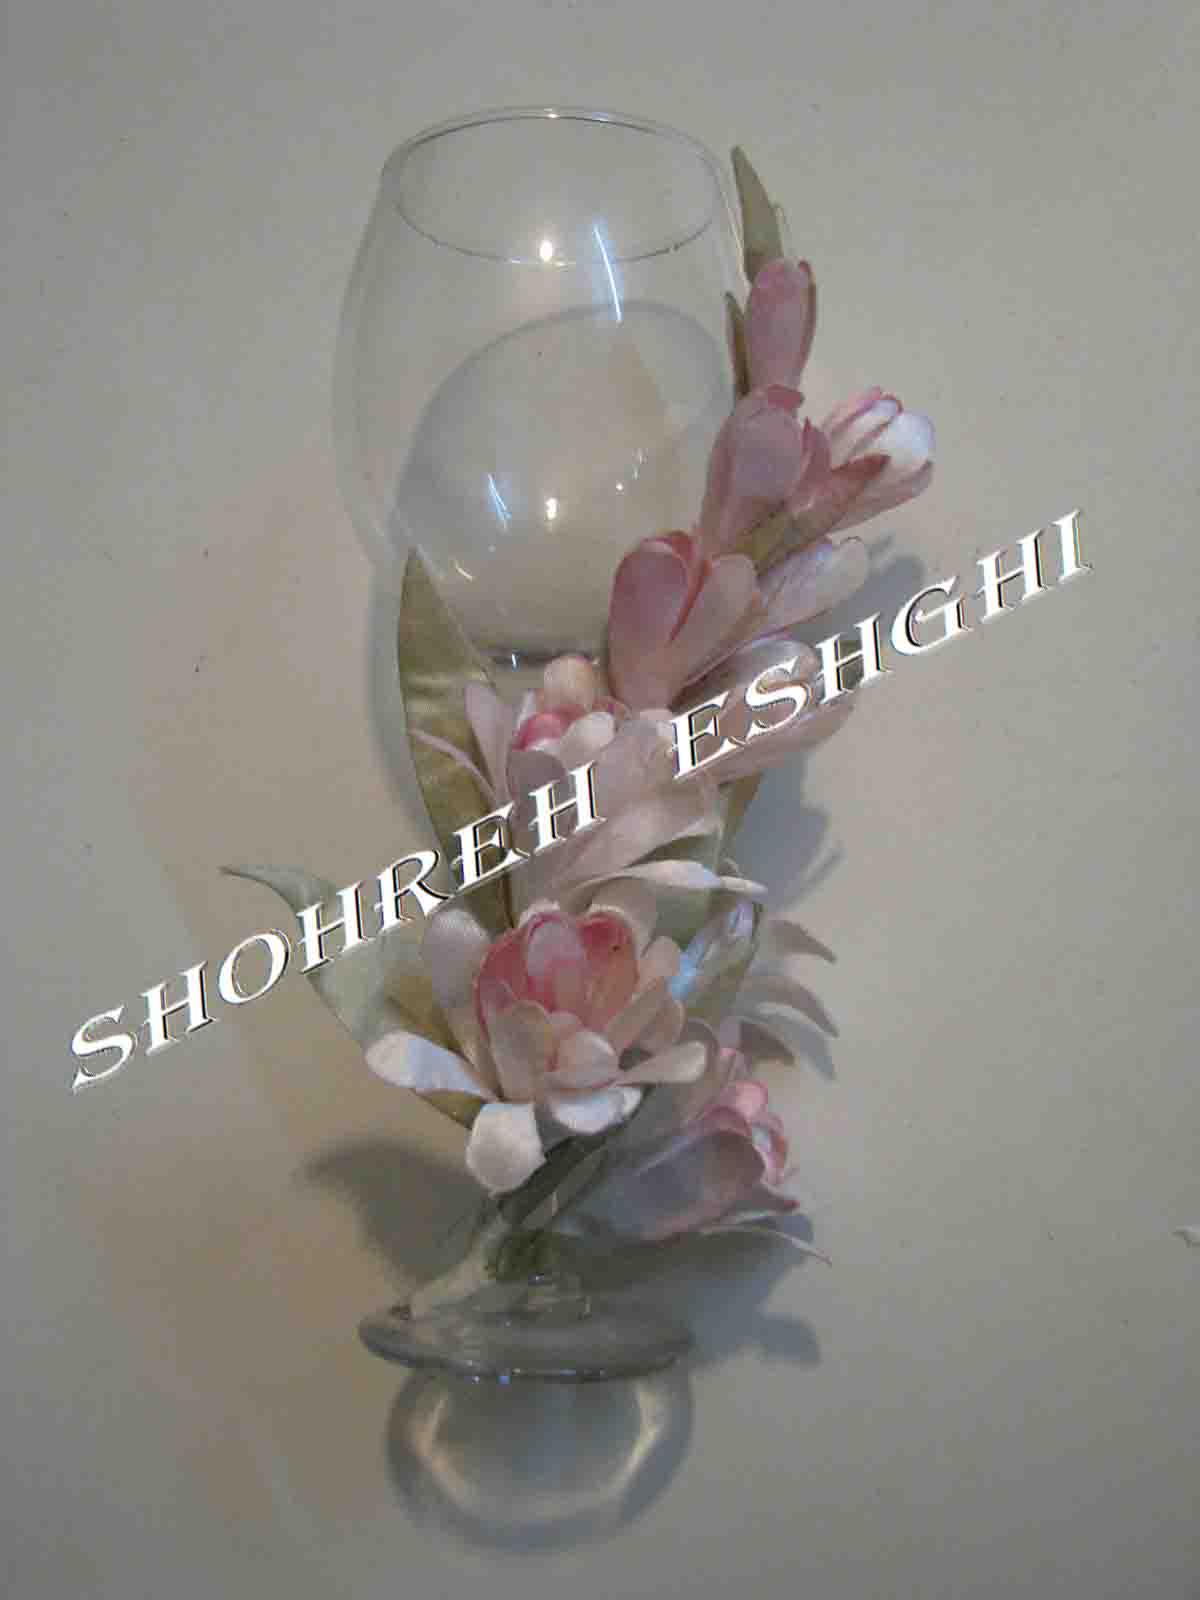 گل زامفیکسی قابل شستشو